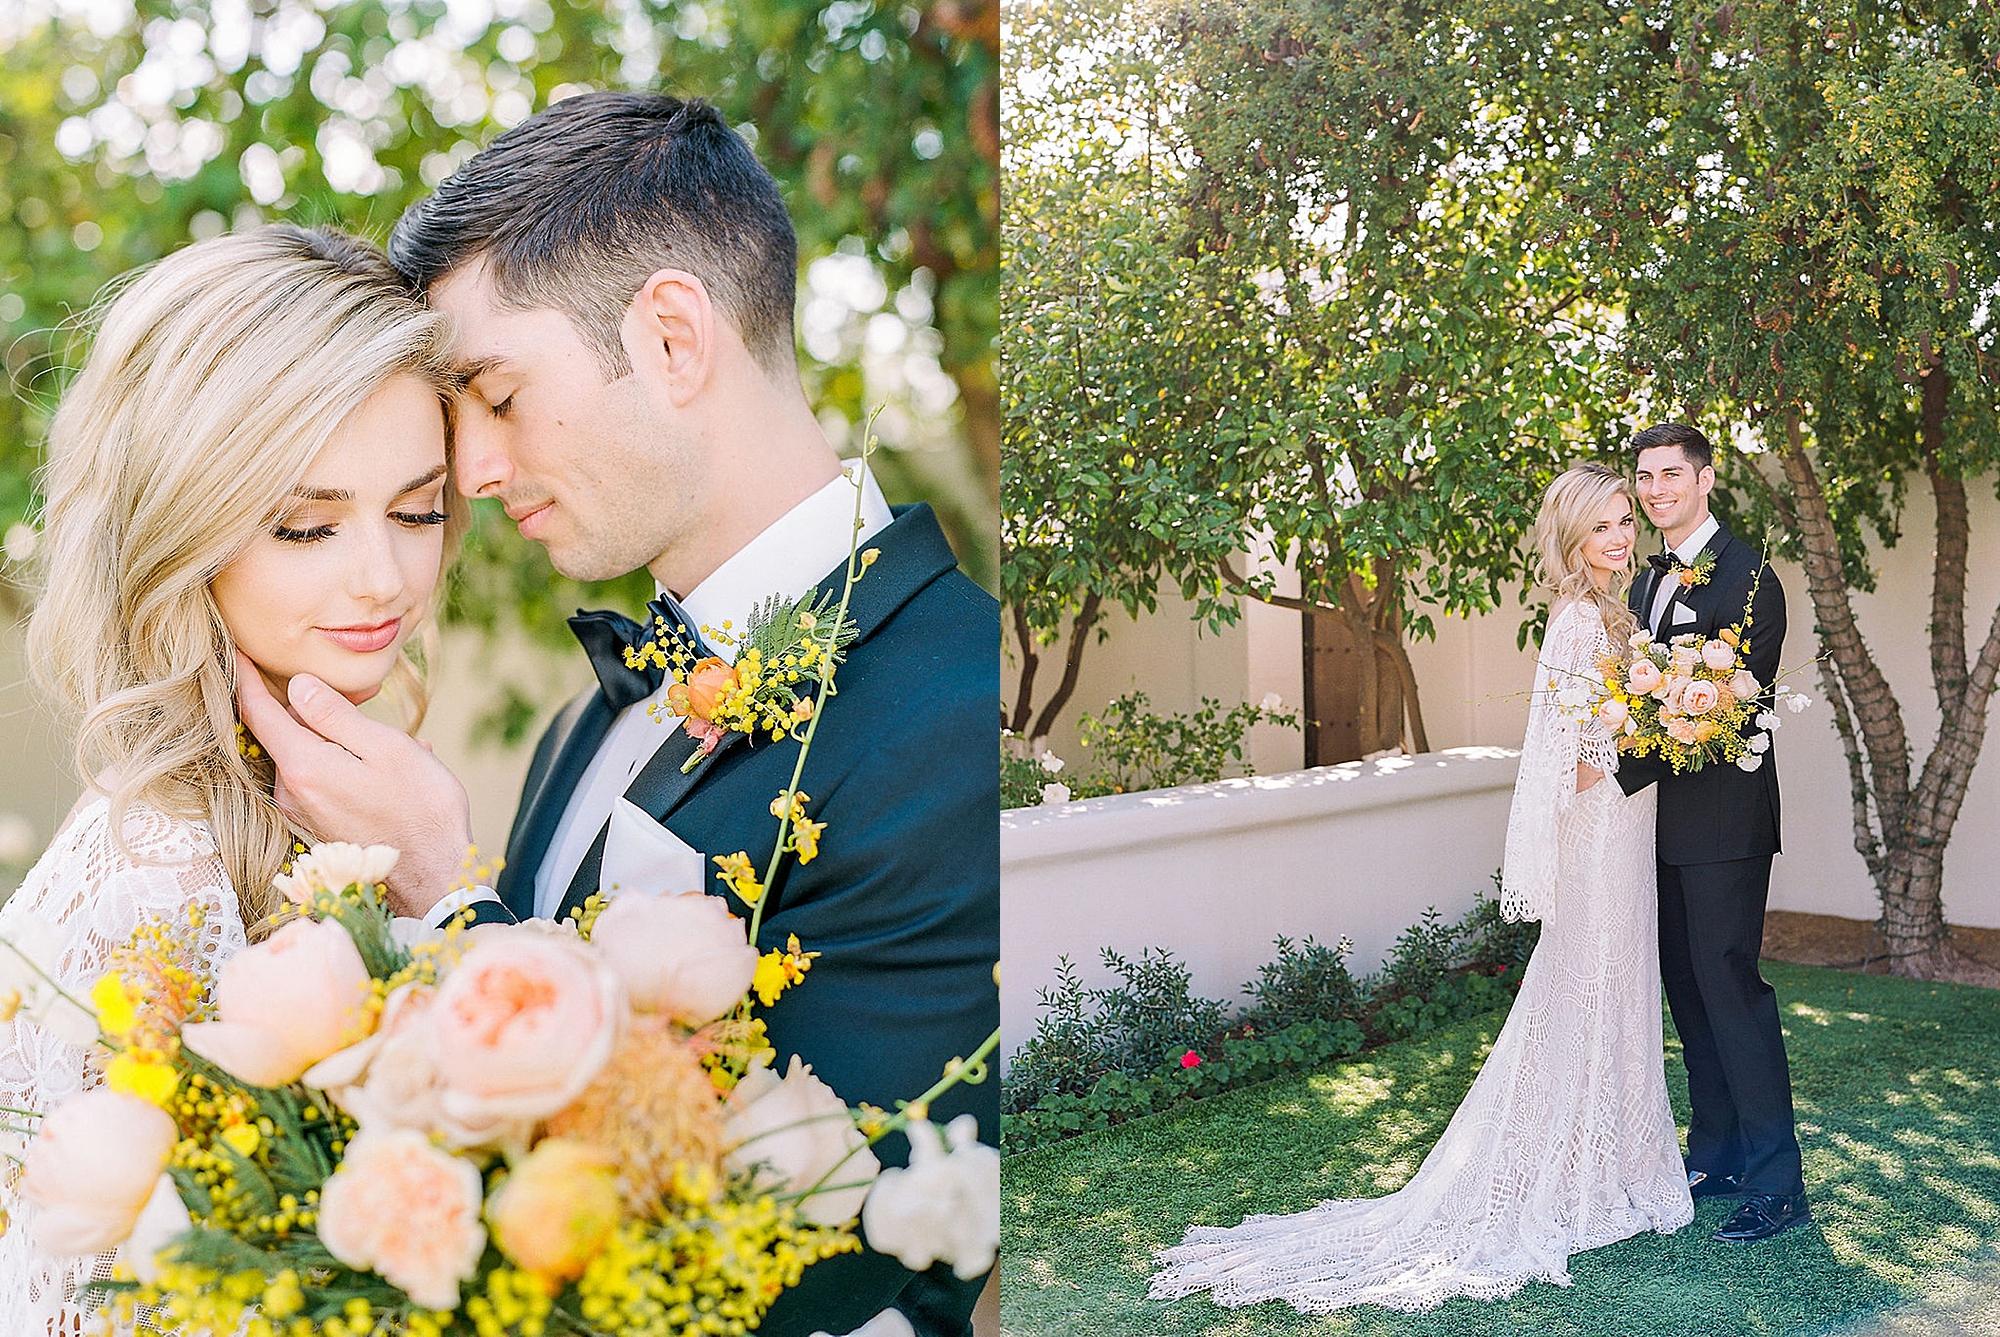 El Chorro Sedona AZ Wedding Photography by Magi Fisher of Magdalena Studios 0022